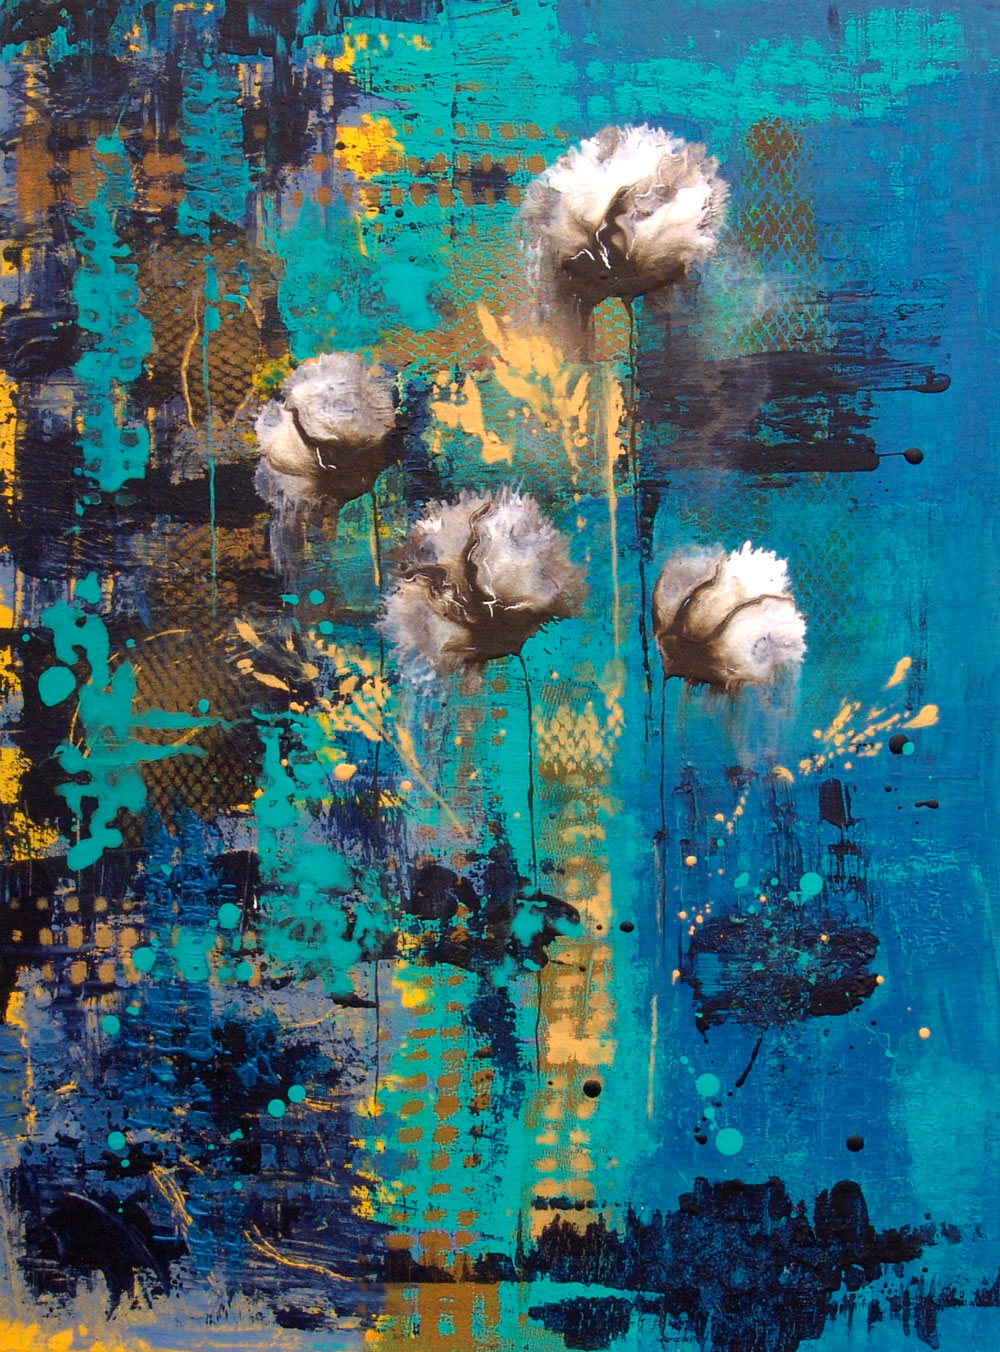 Blue Rain Abstract Painting Decor Canvas Wall Art Flower